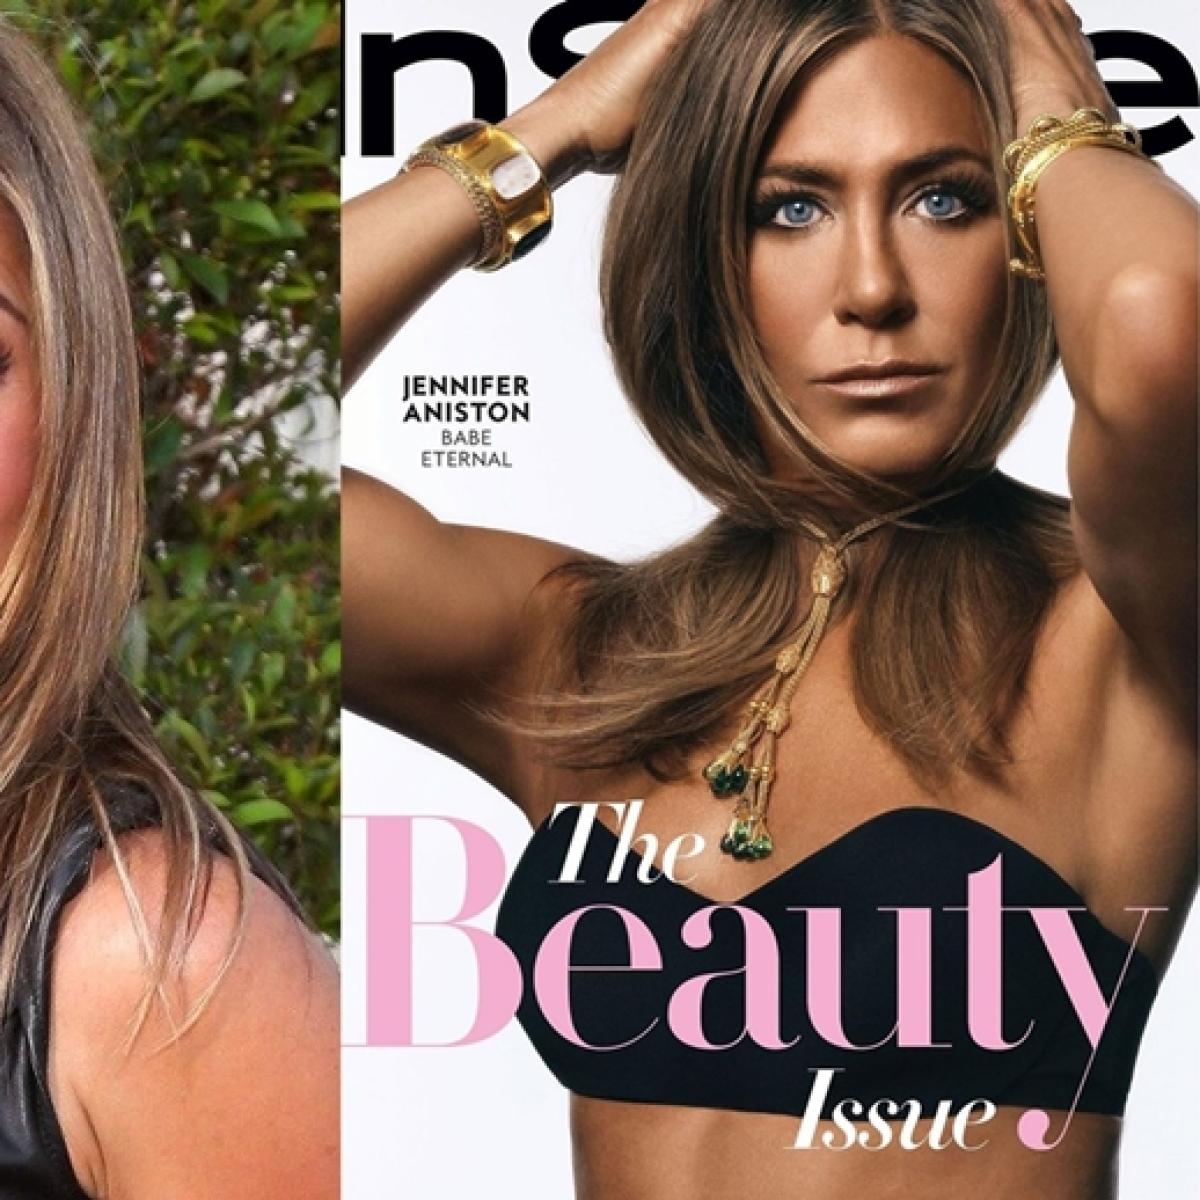 Jennifer Aniston receives flak for dark complexion on latest magazine cover